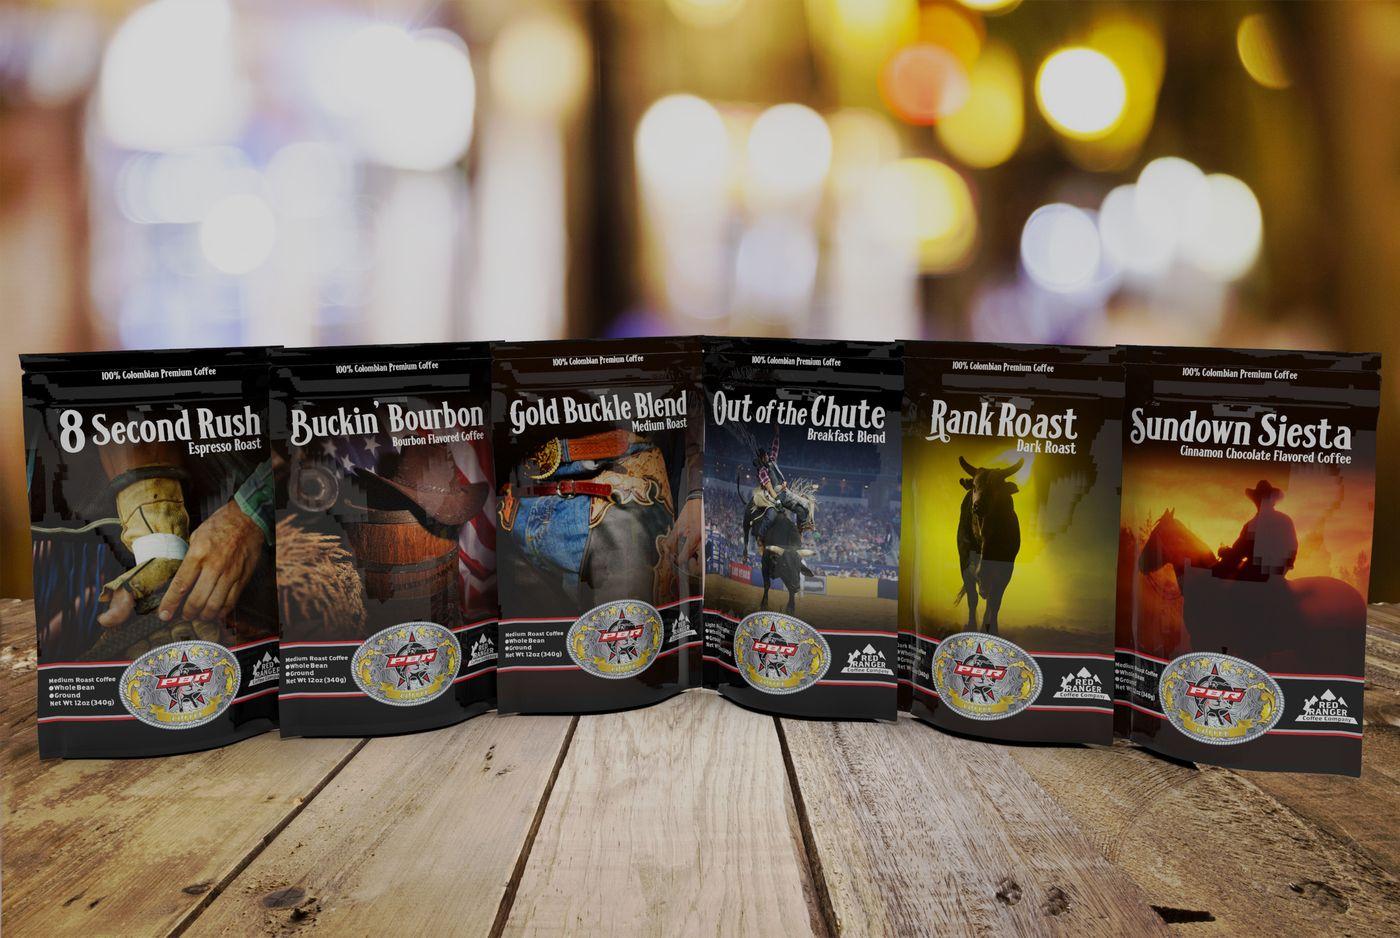 PBR Snack Range